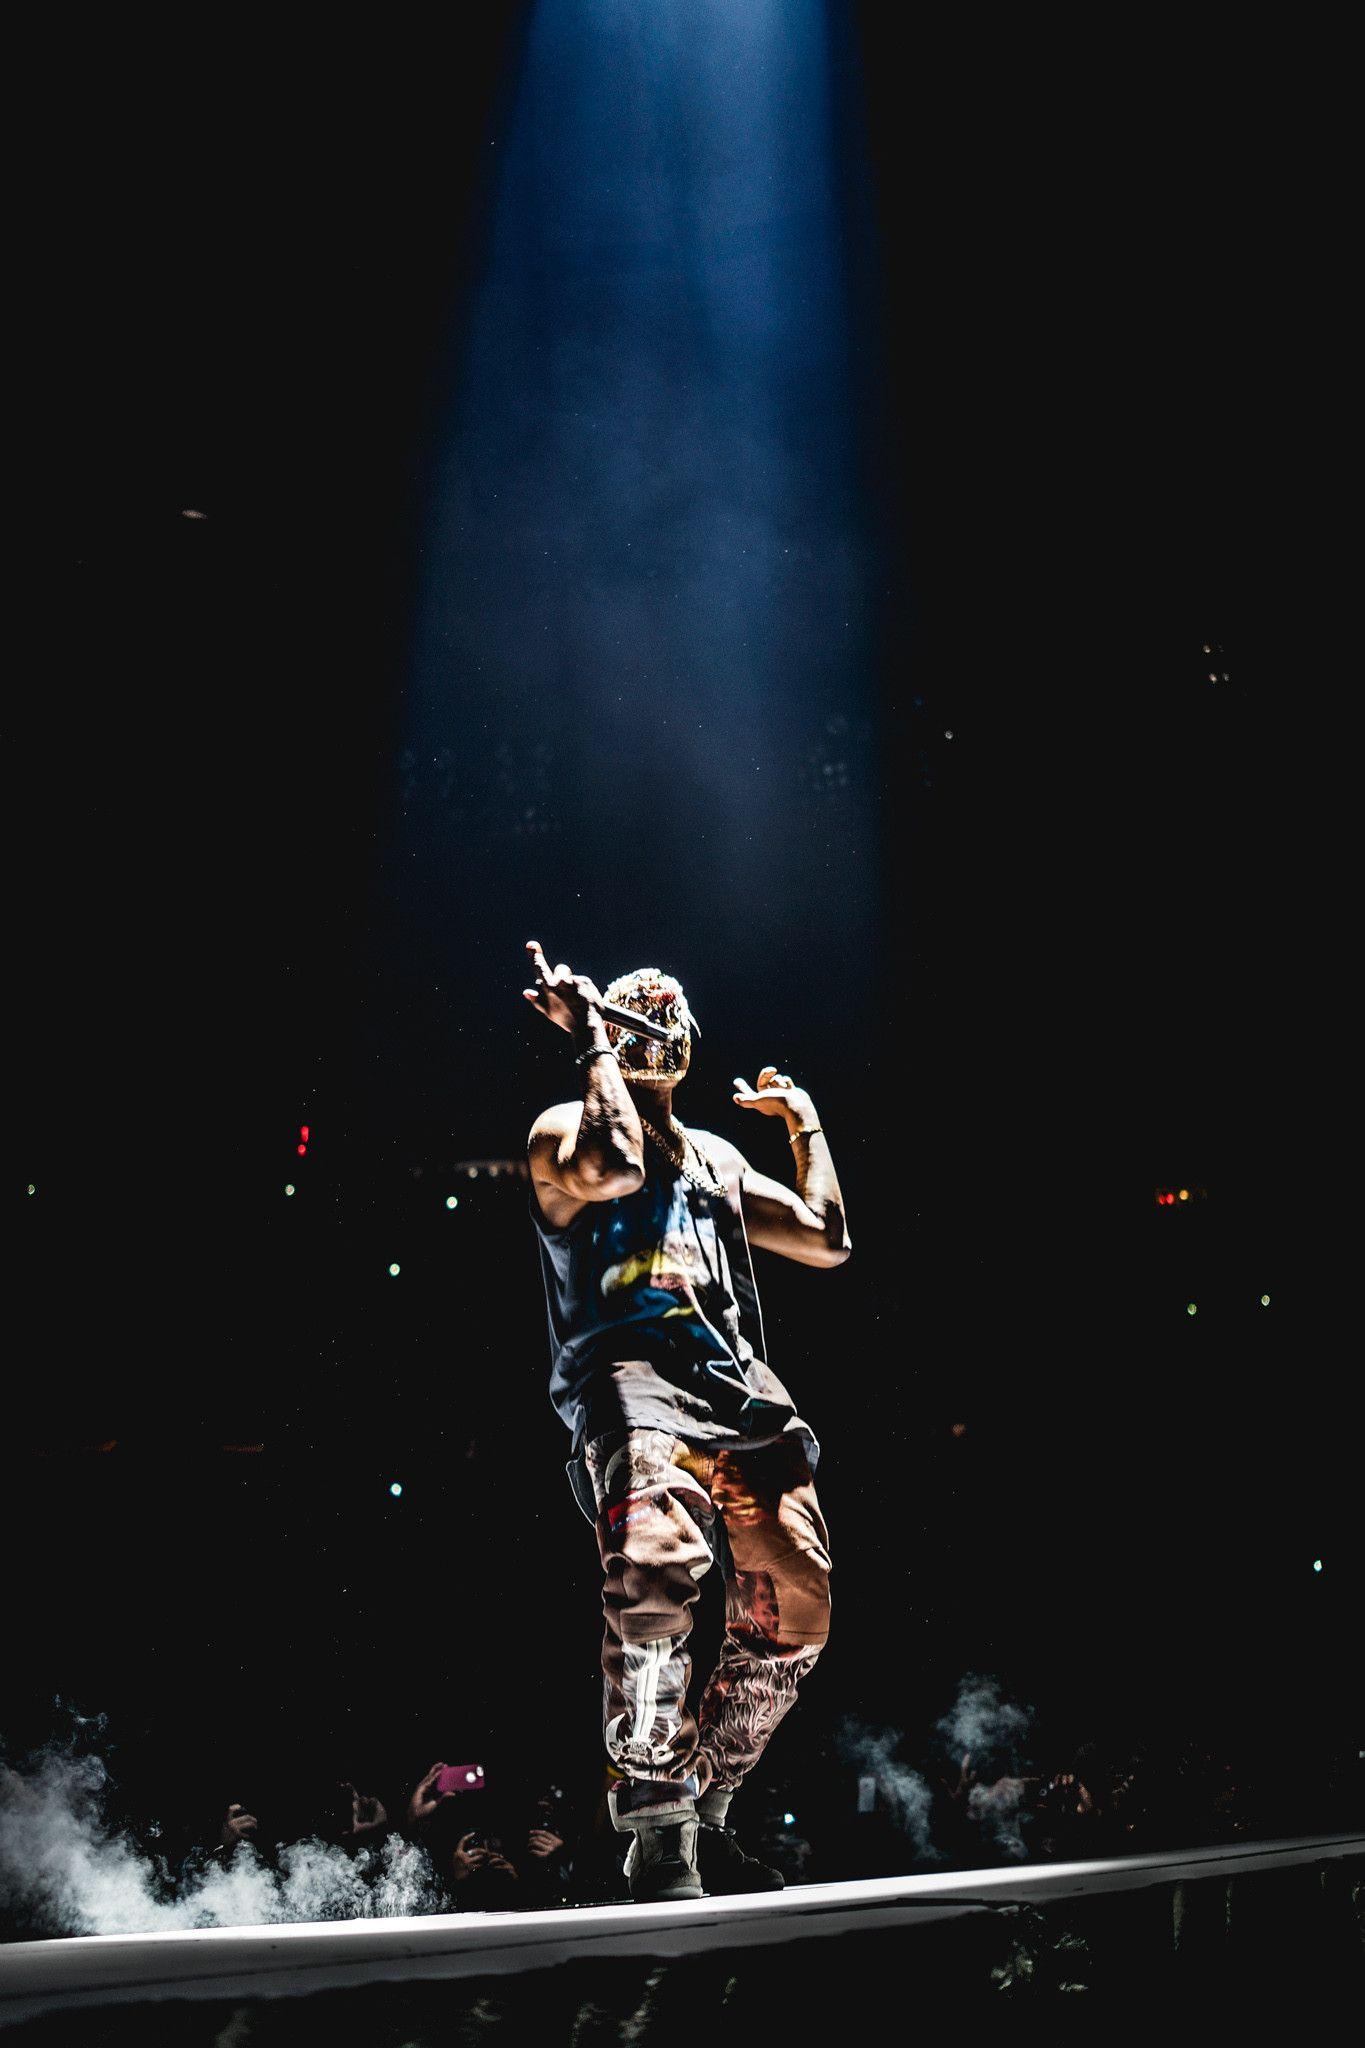 Itt Parallax Compatible Ios 7 Yeezus Tour Promo Wallpaper Yeezus Wallpaper Kanye West Wallpaper Hip Hop Art